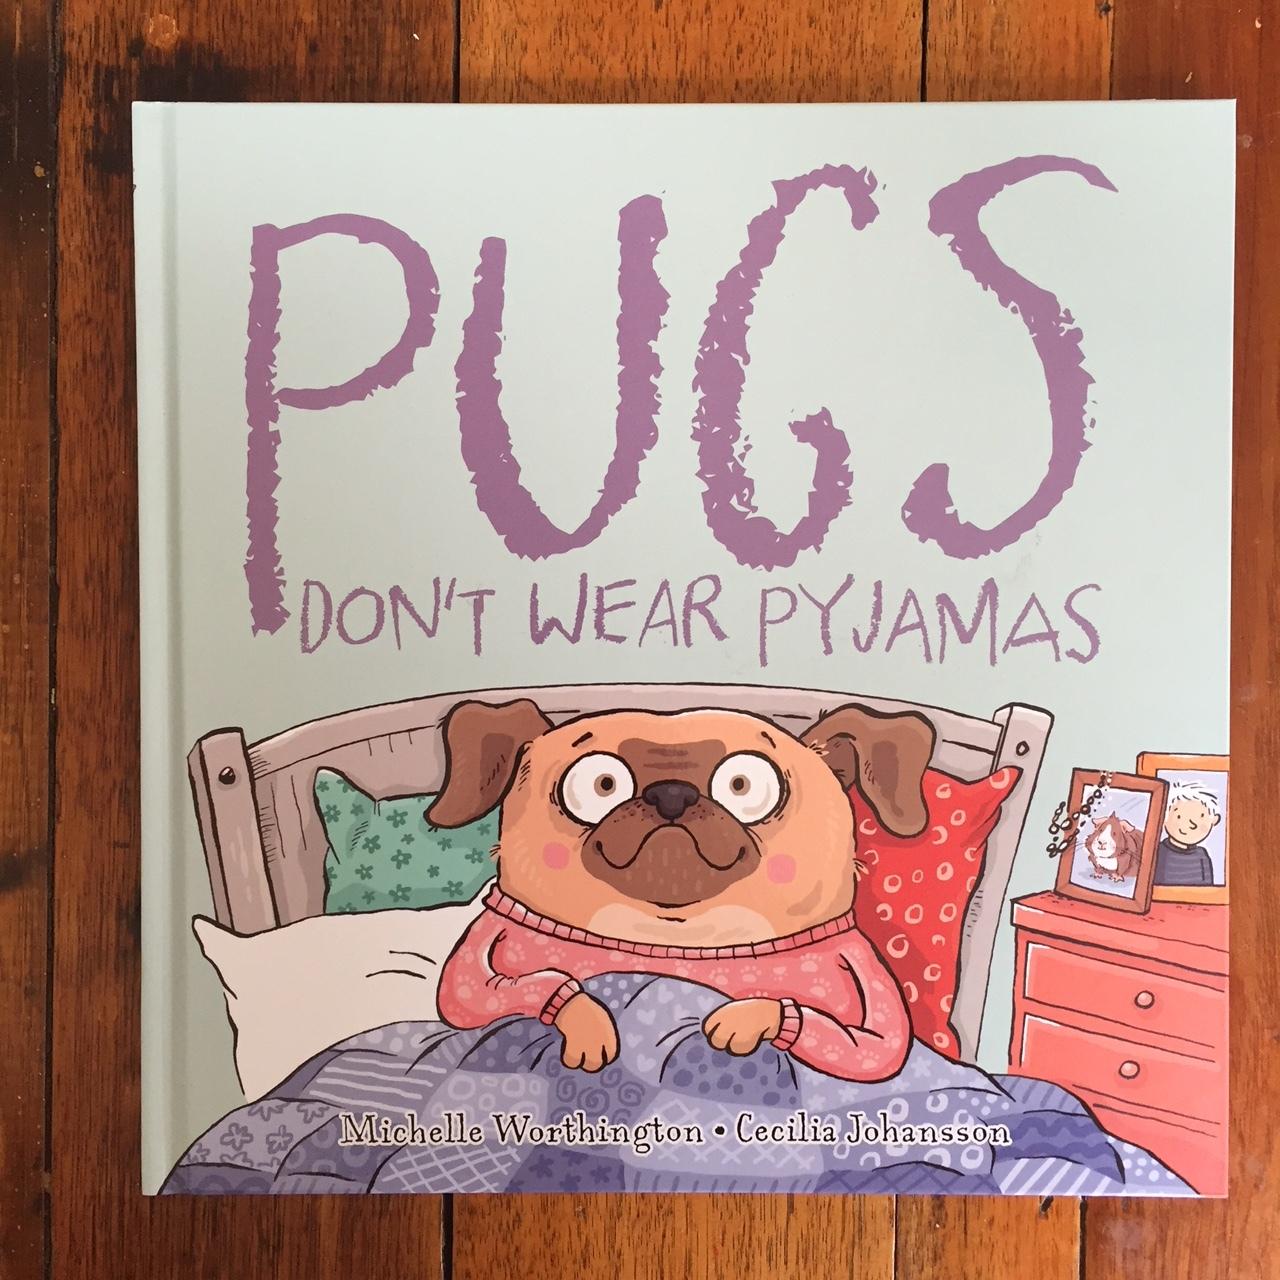 Review - Pugs Don't Wear Pyjamas